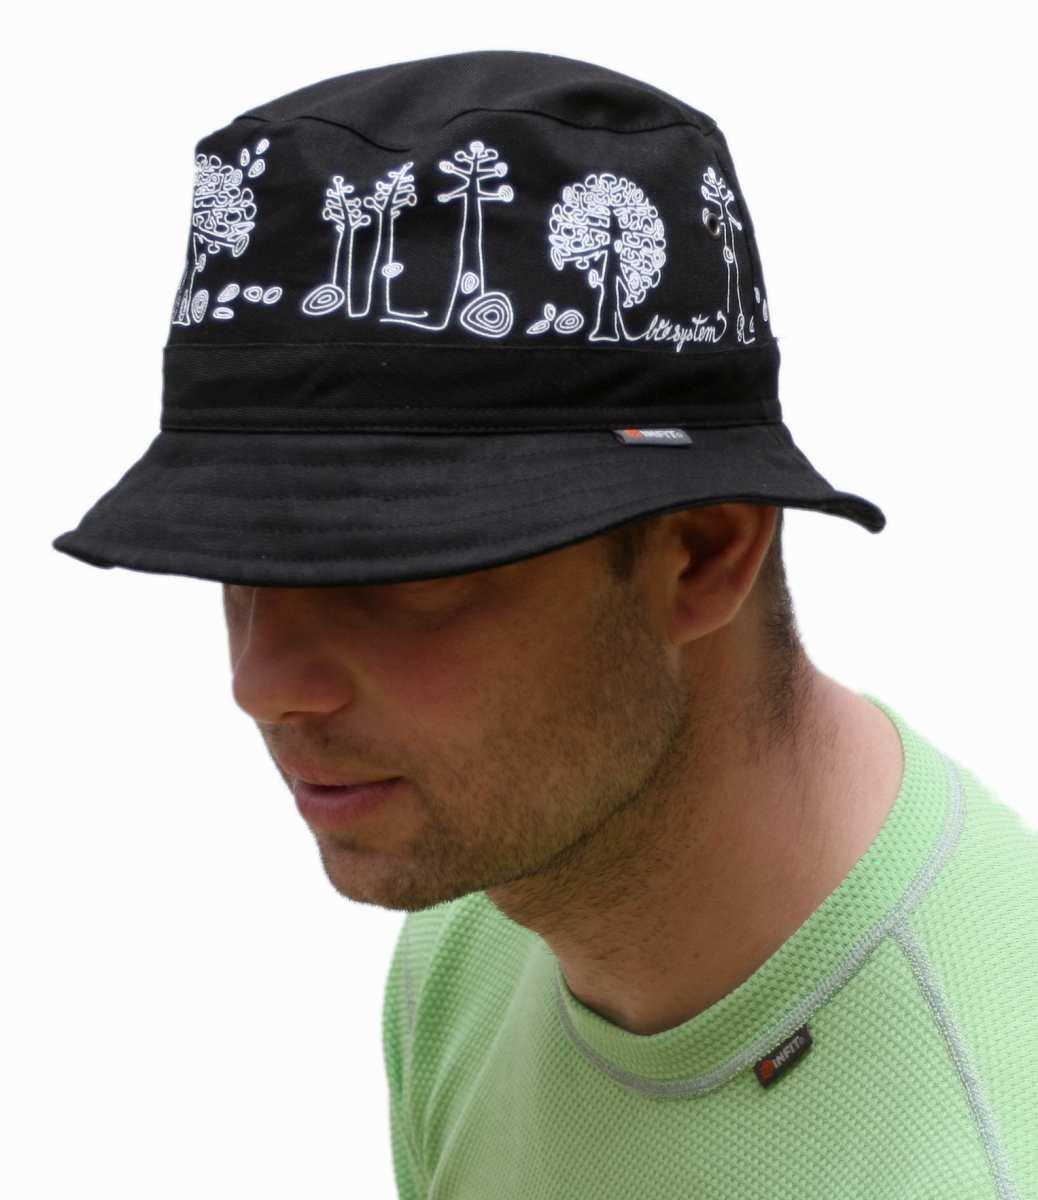 Daen letní klobouk černý vzor Stromy 2ed9877172